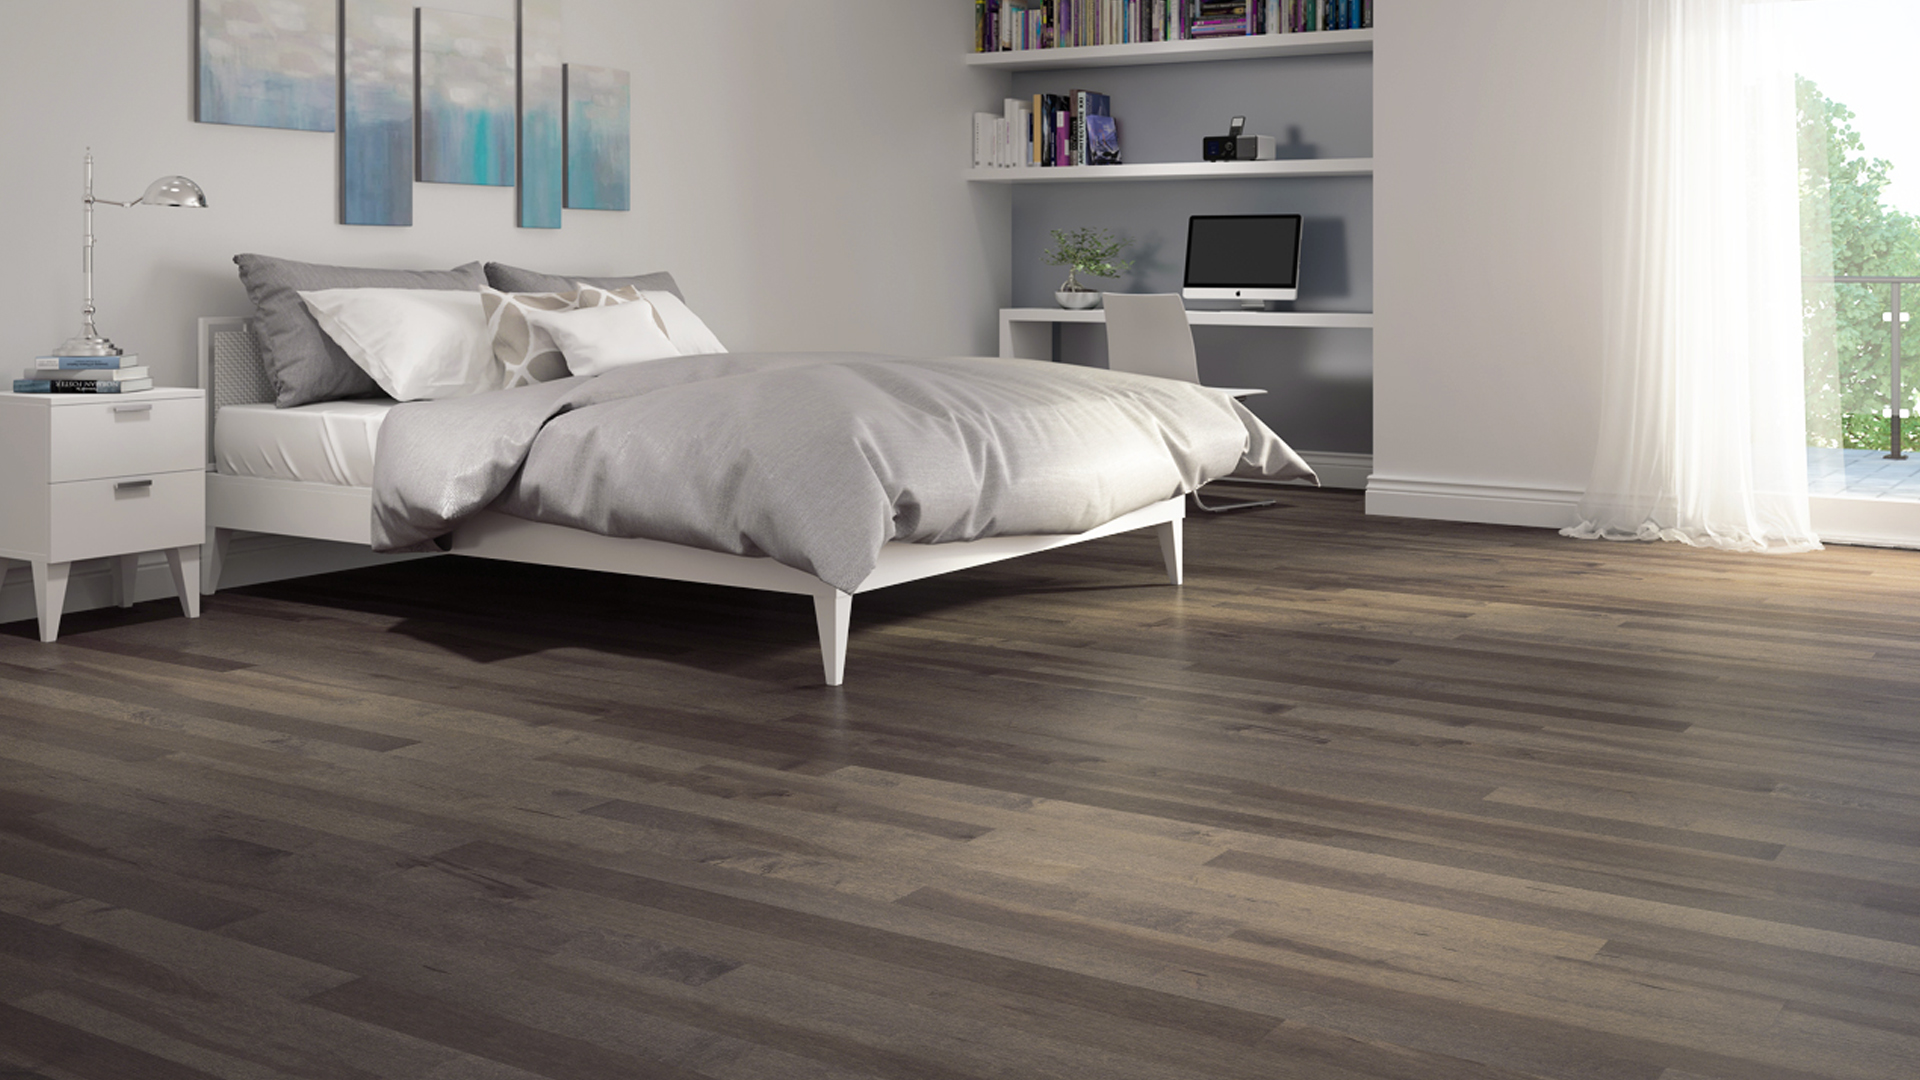 Hard maple dark grey | Dubeau hardwood floors | Bedroom decor